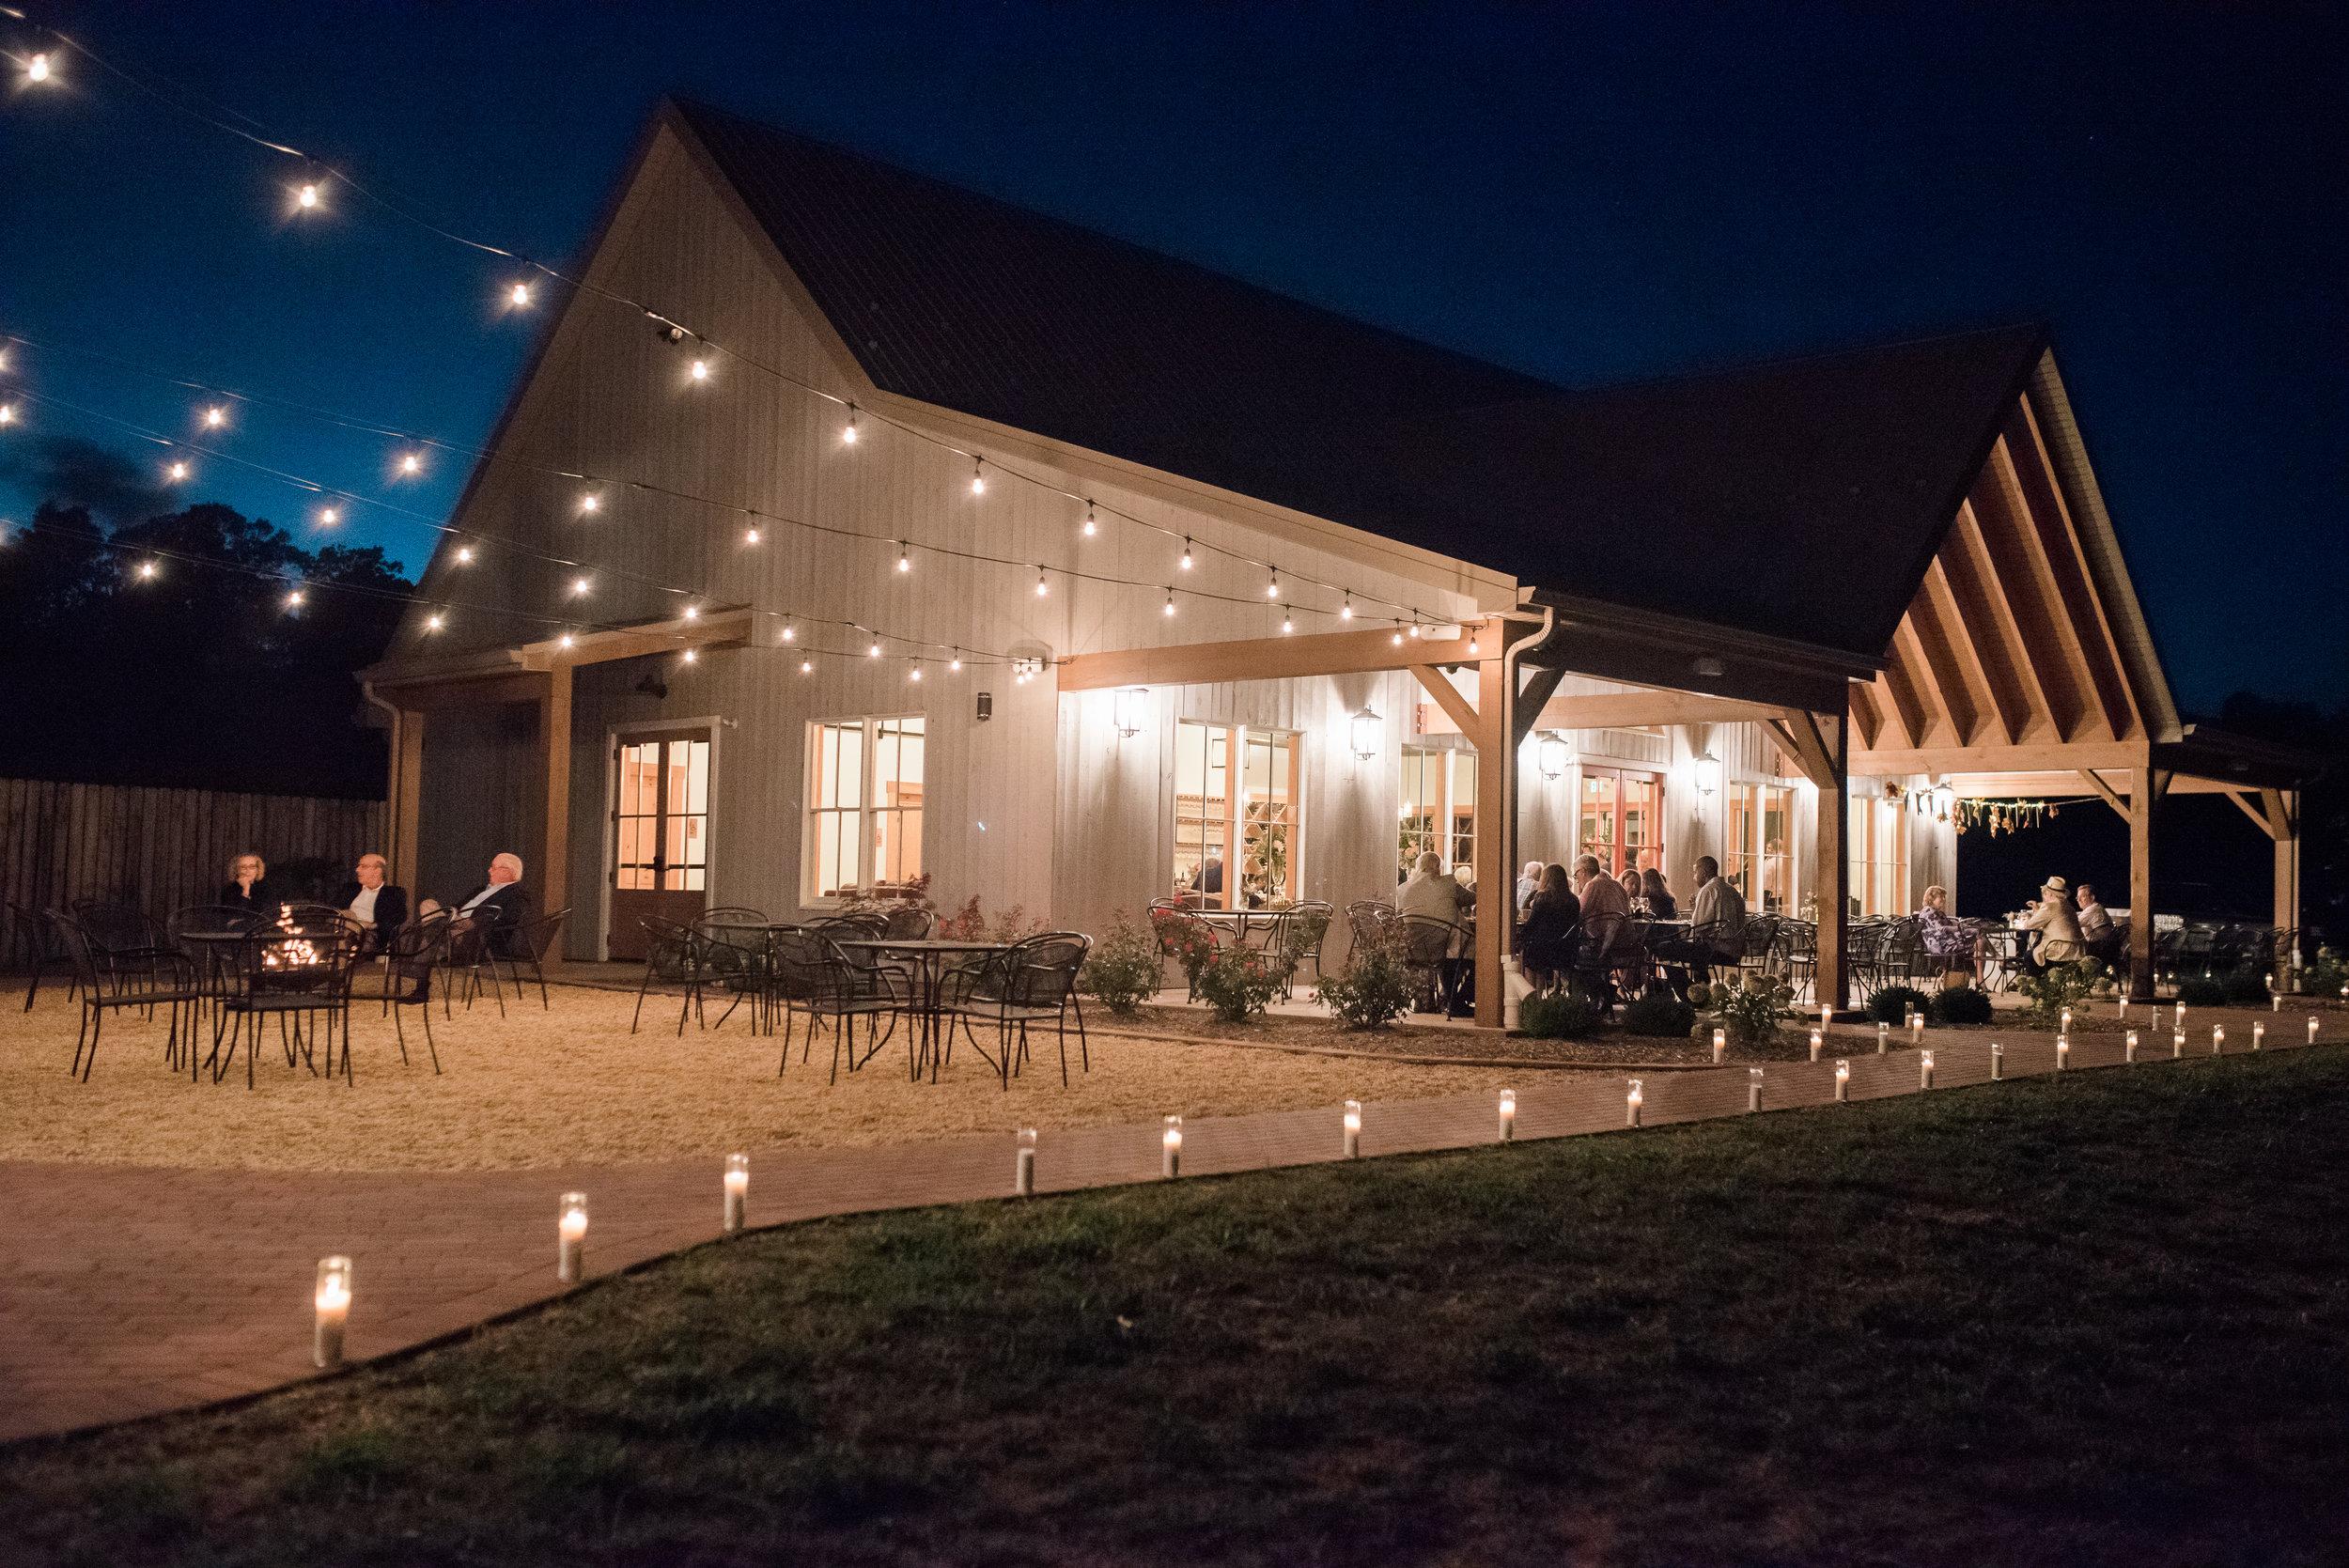 Engagement-Maryland-Winery-photos-by-BKLP-Breanna-Kuhlmann-1.jpg